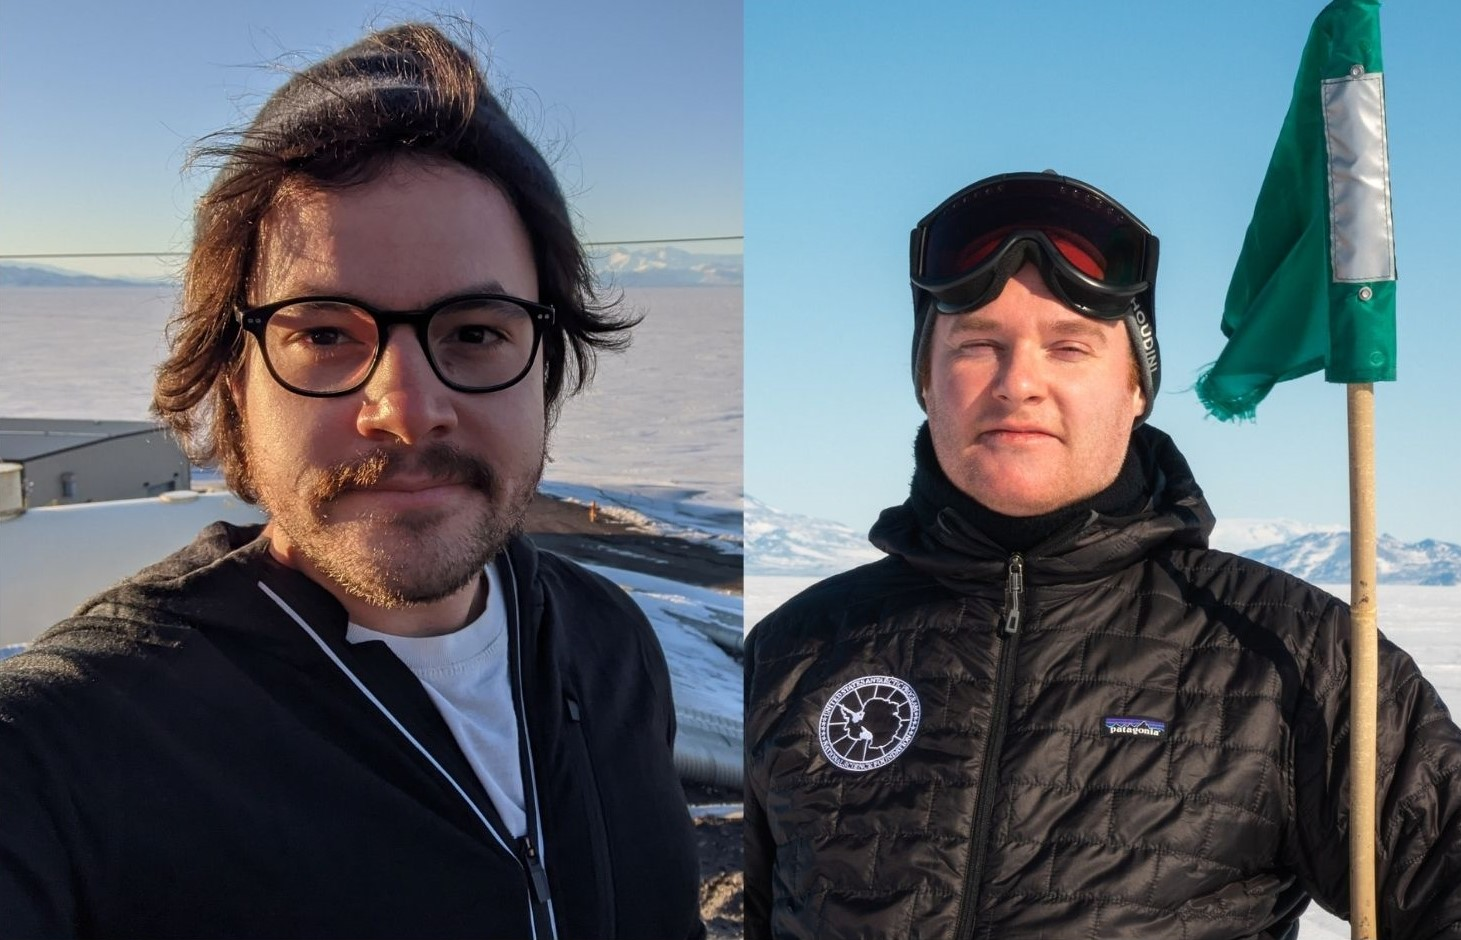 news_feat_meet-icecube-2020-2021-winterovers-josh-and-martin